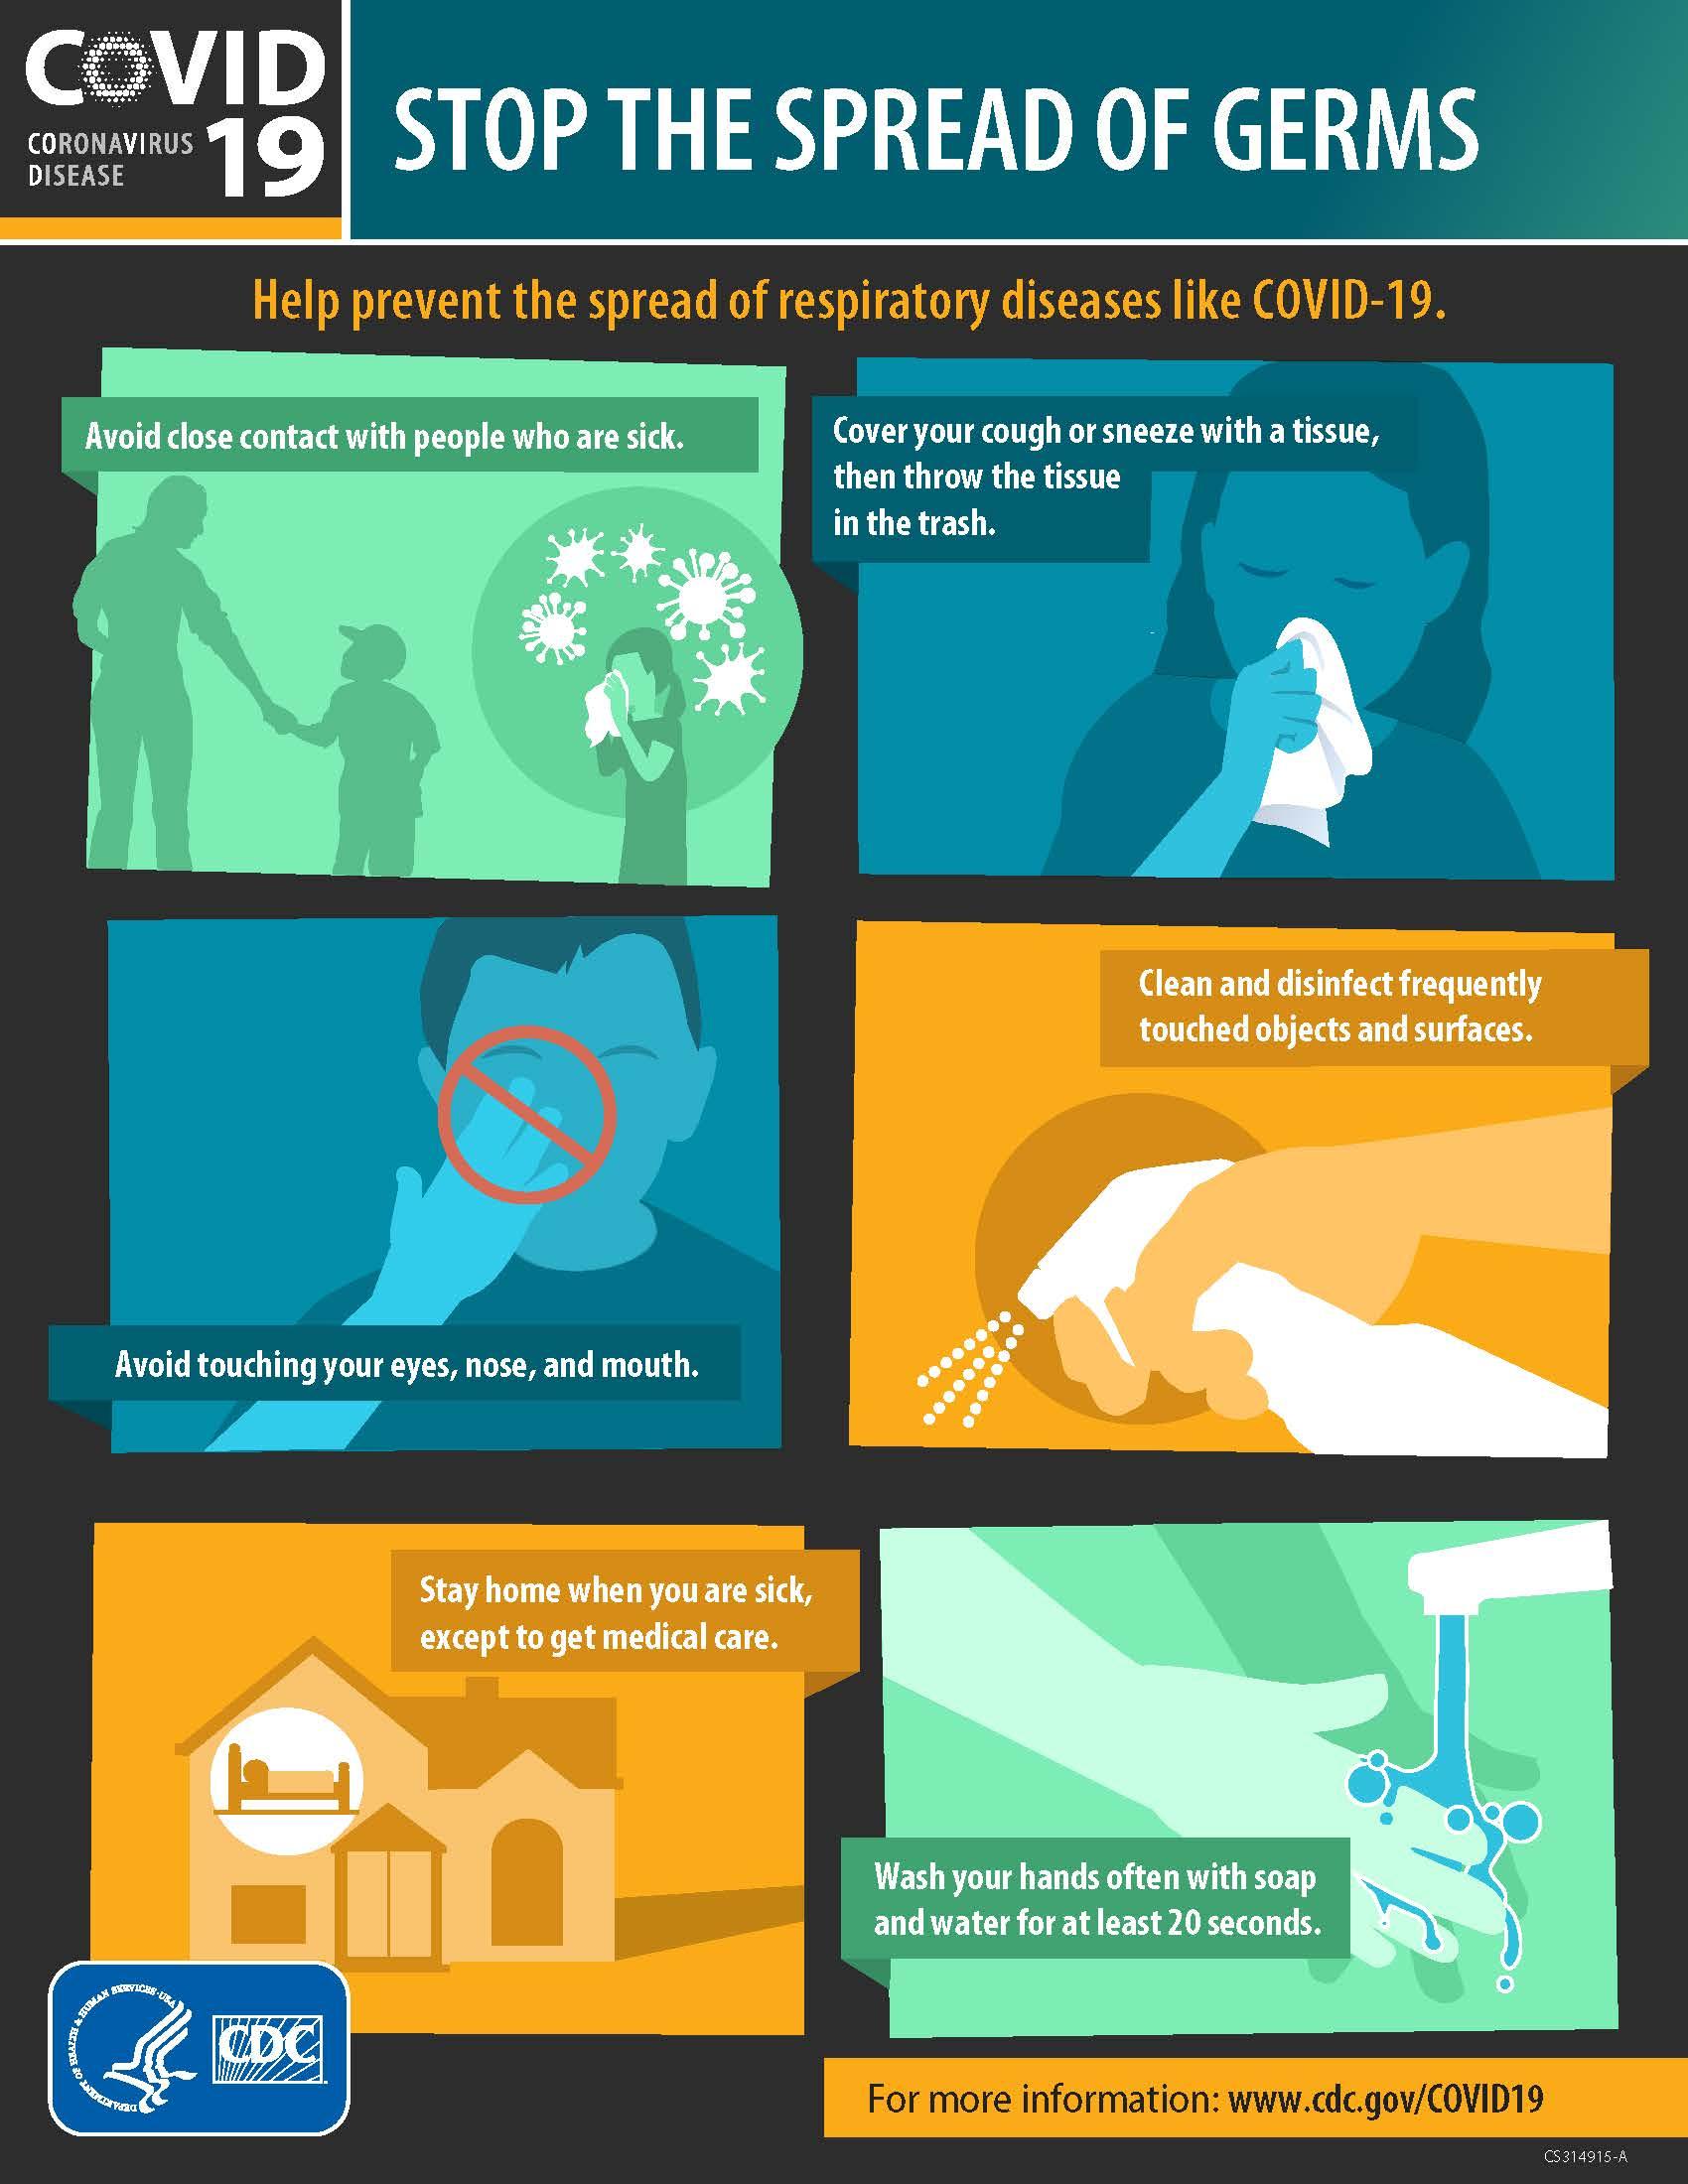 COVID 19 CDC Coronavirus flyer Image